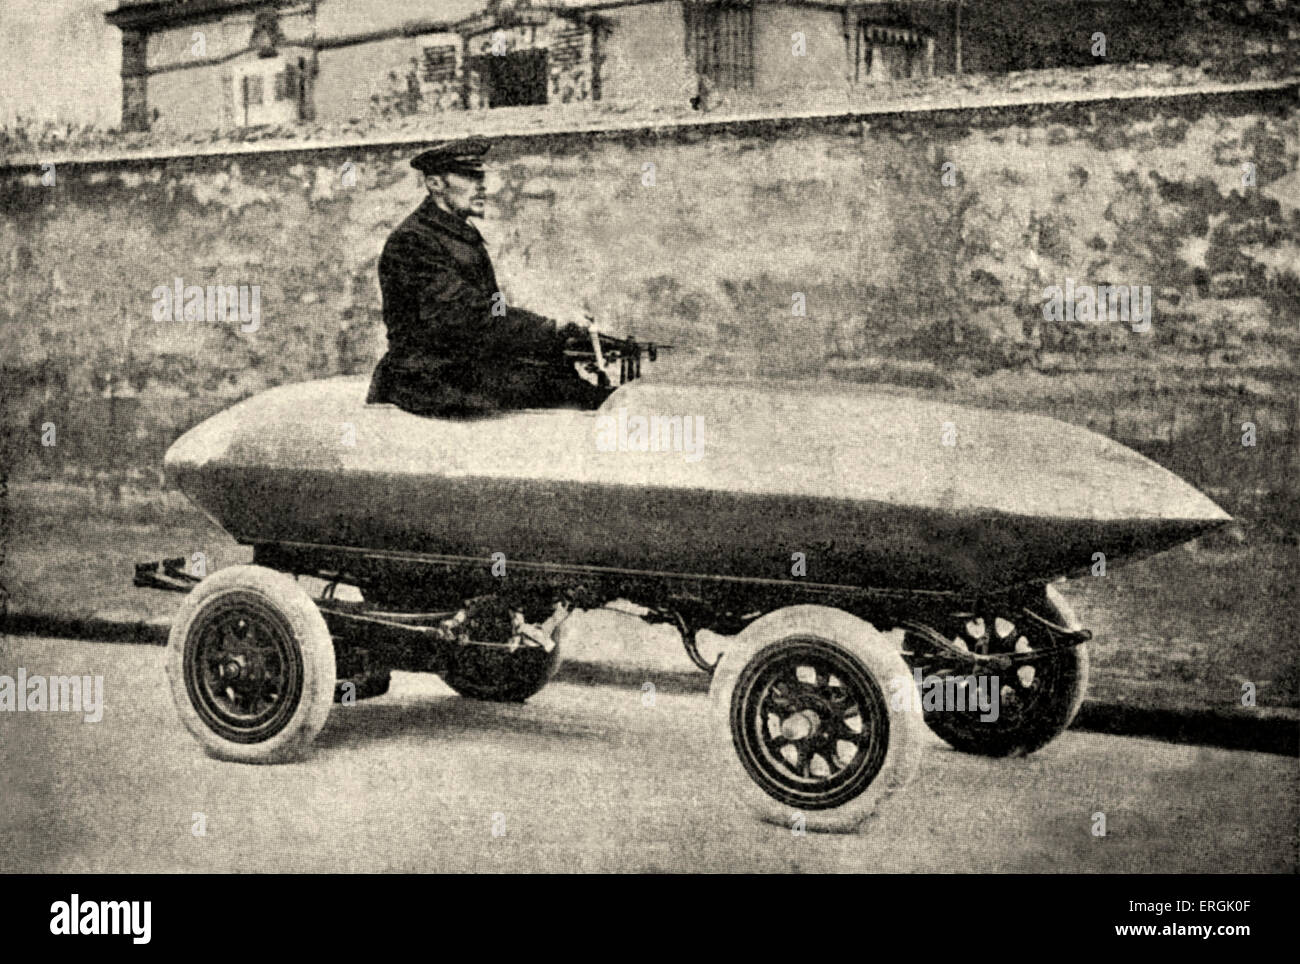 Electric racing car with Rothschild bodywork in partinium (aluminium alloy). - Stock Image